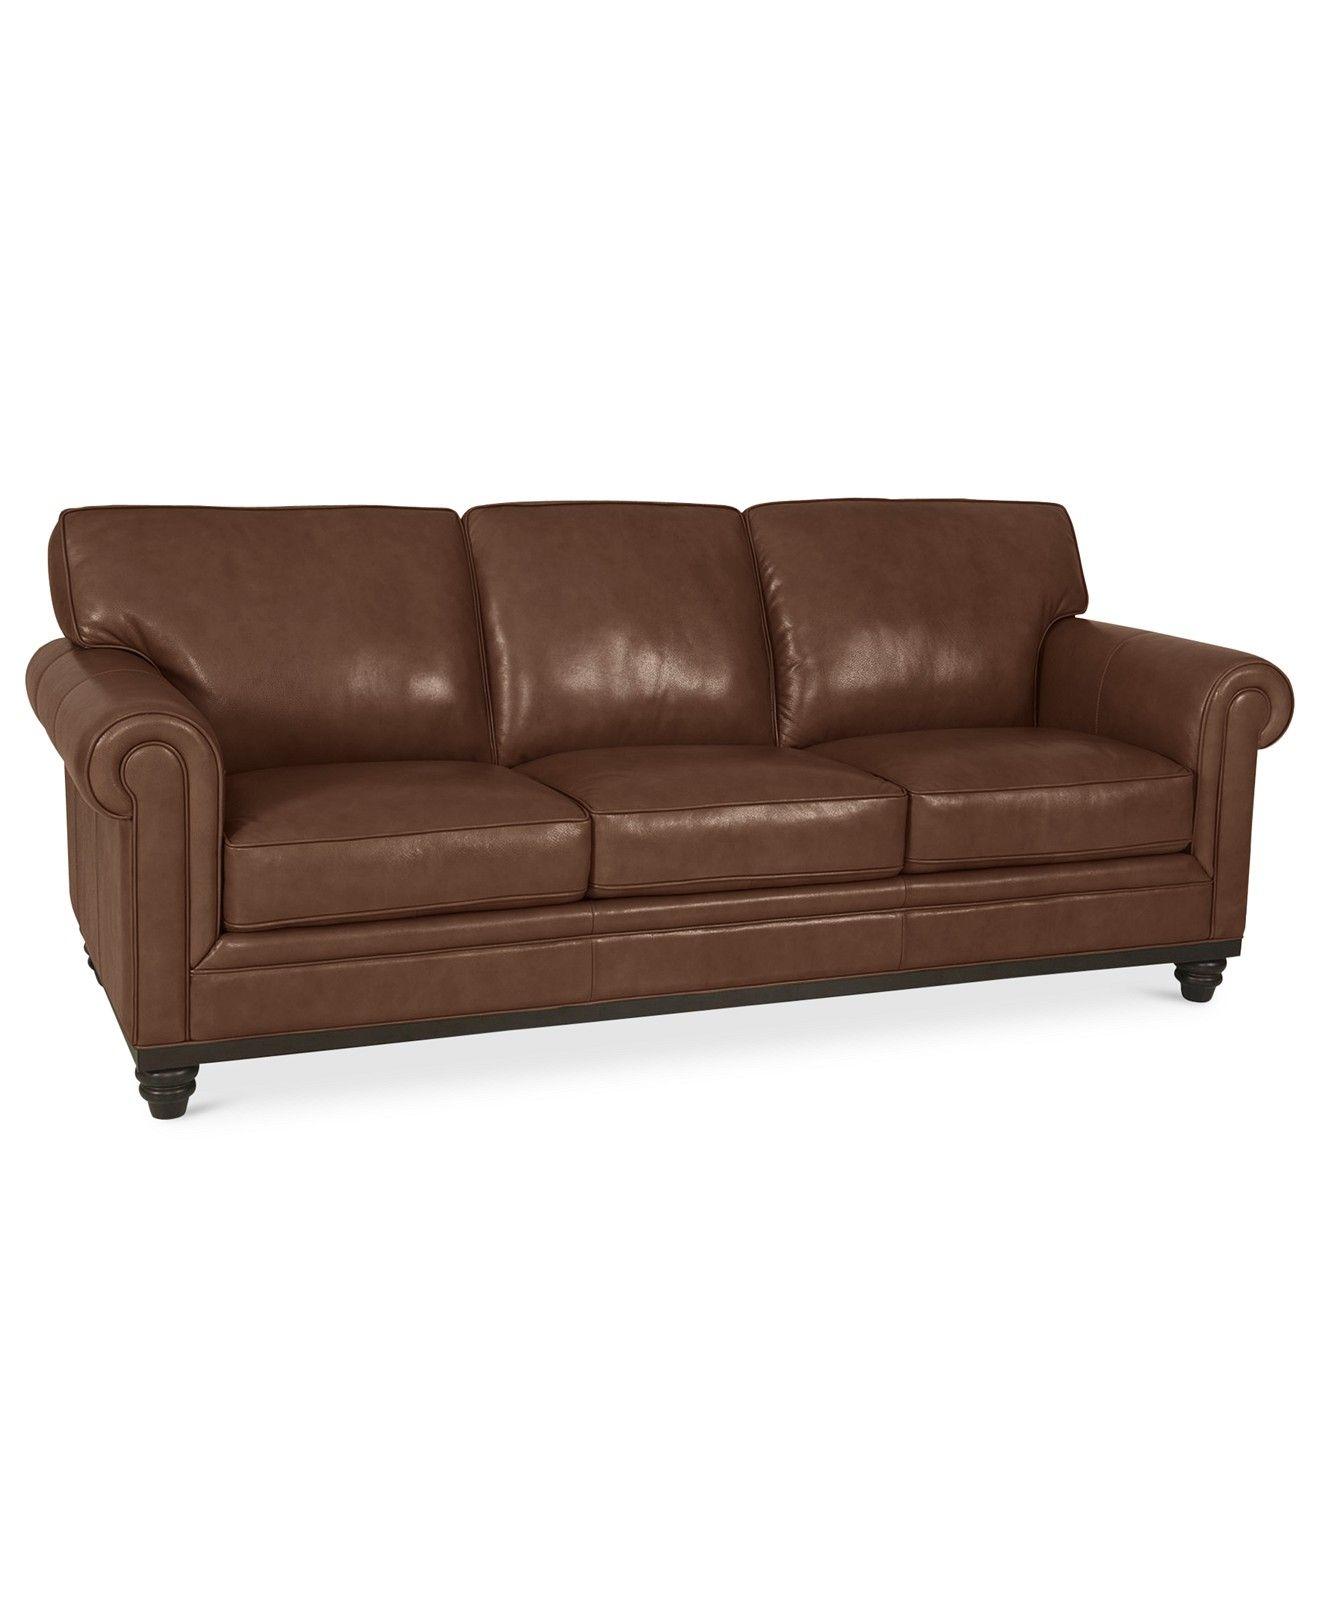 Bon Martha Stewart Collection Bradyn 89 Leather Sofa, Created For Macyu0027s    Couches U0026 Sofas   Furniture   Macyu0027s